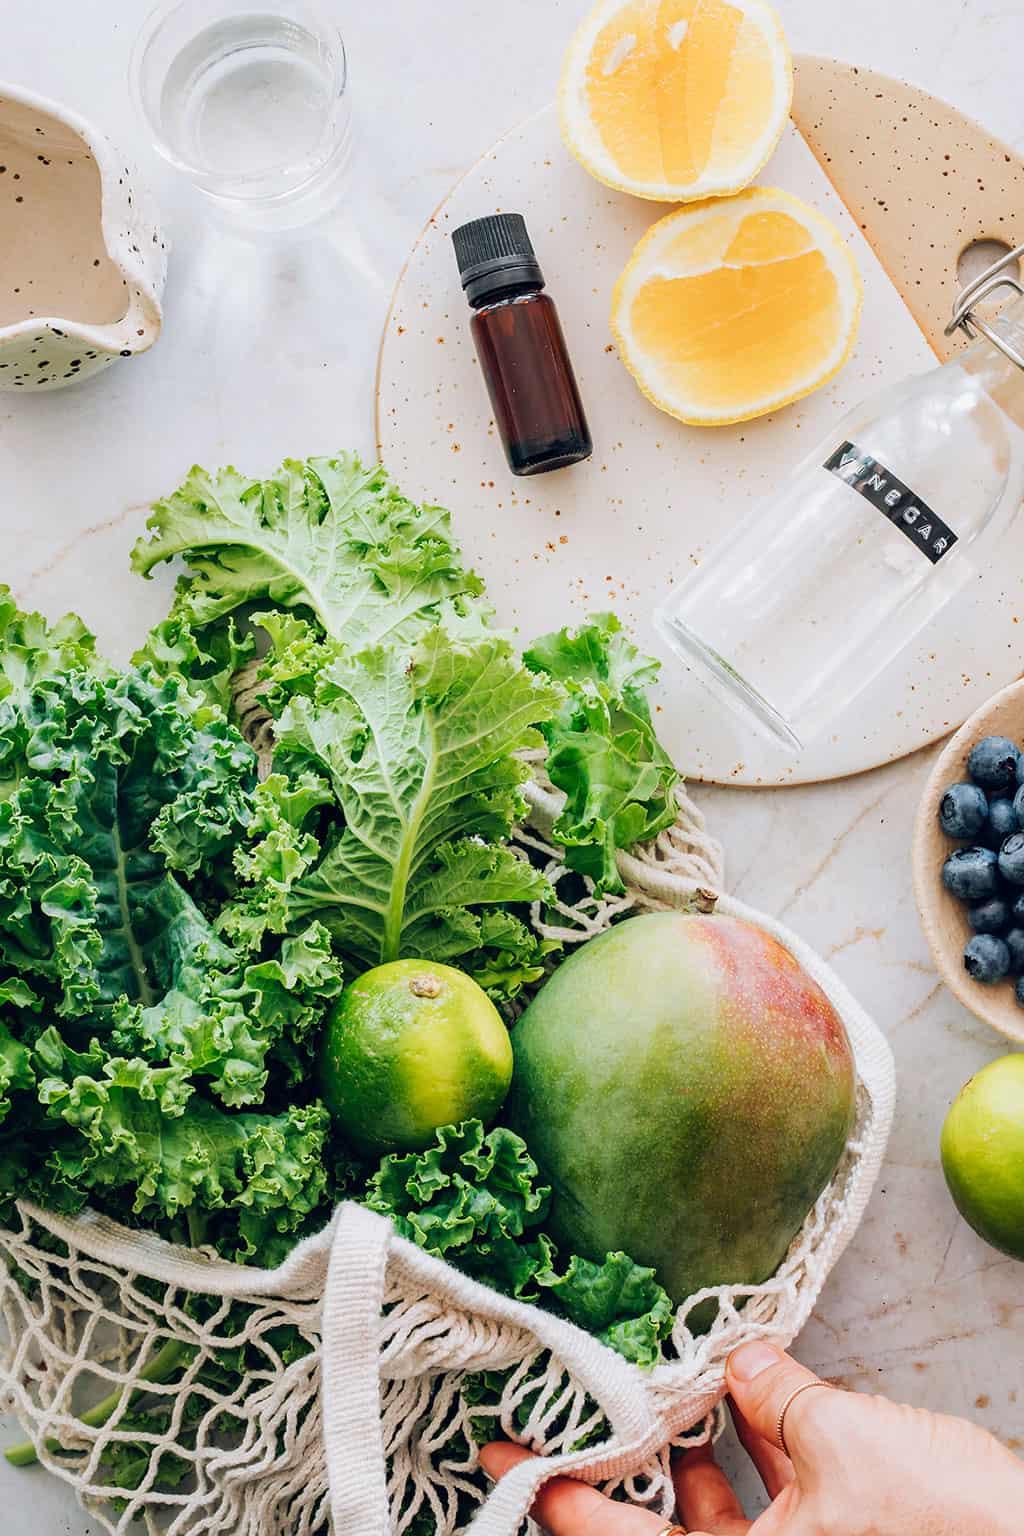 Ingredients for Fruit + Veggie Cleaning Spray